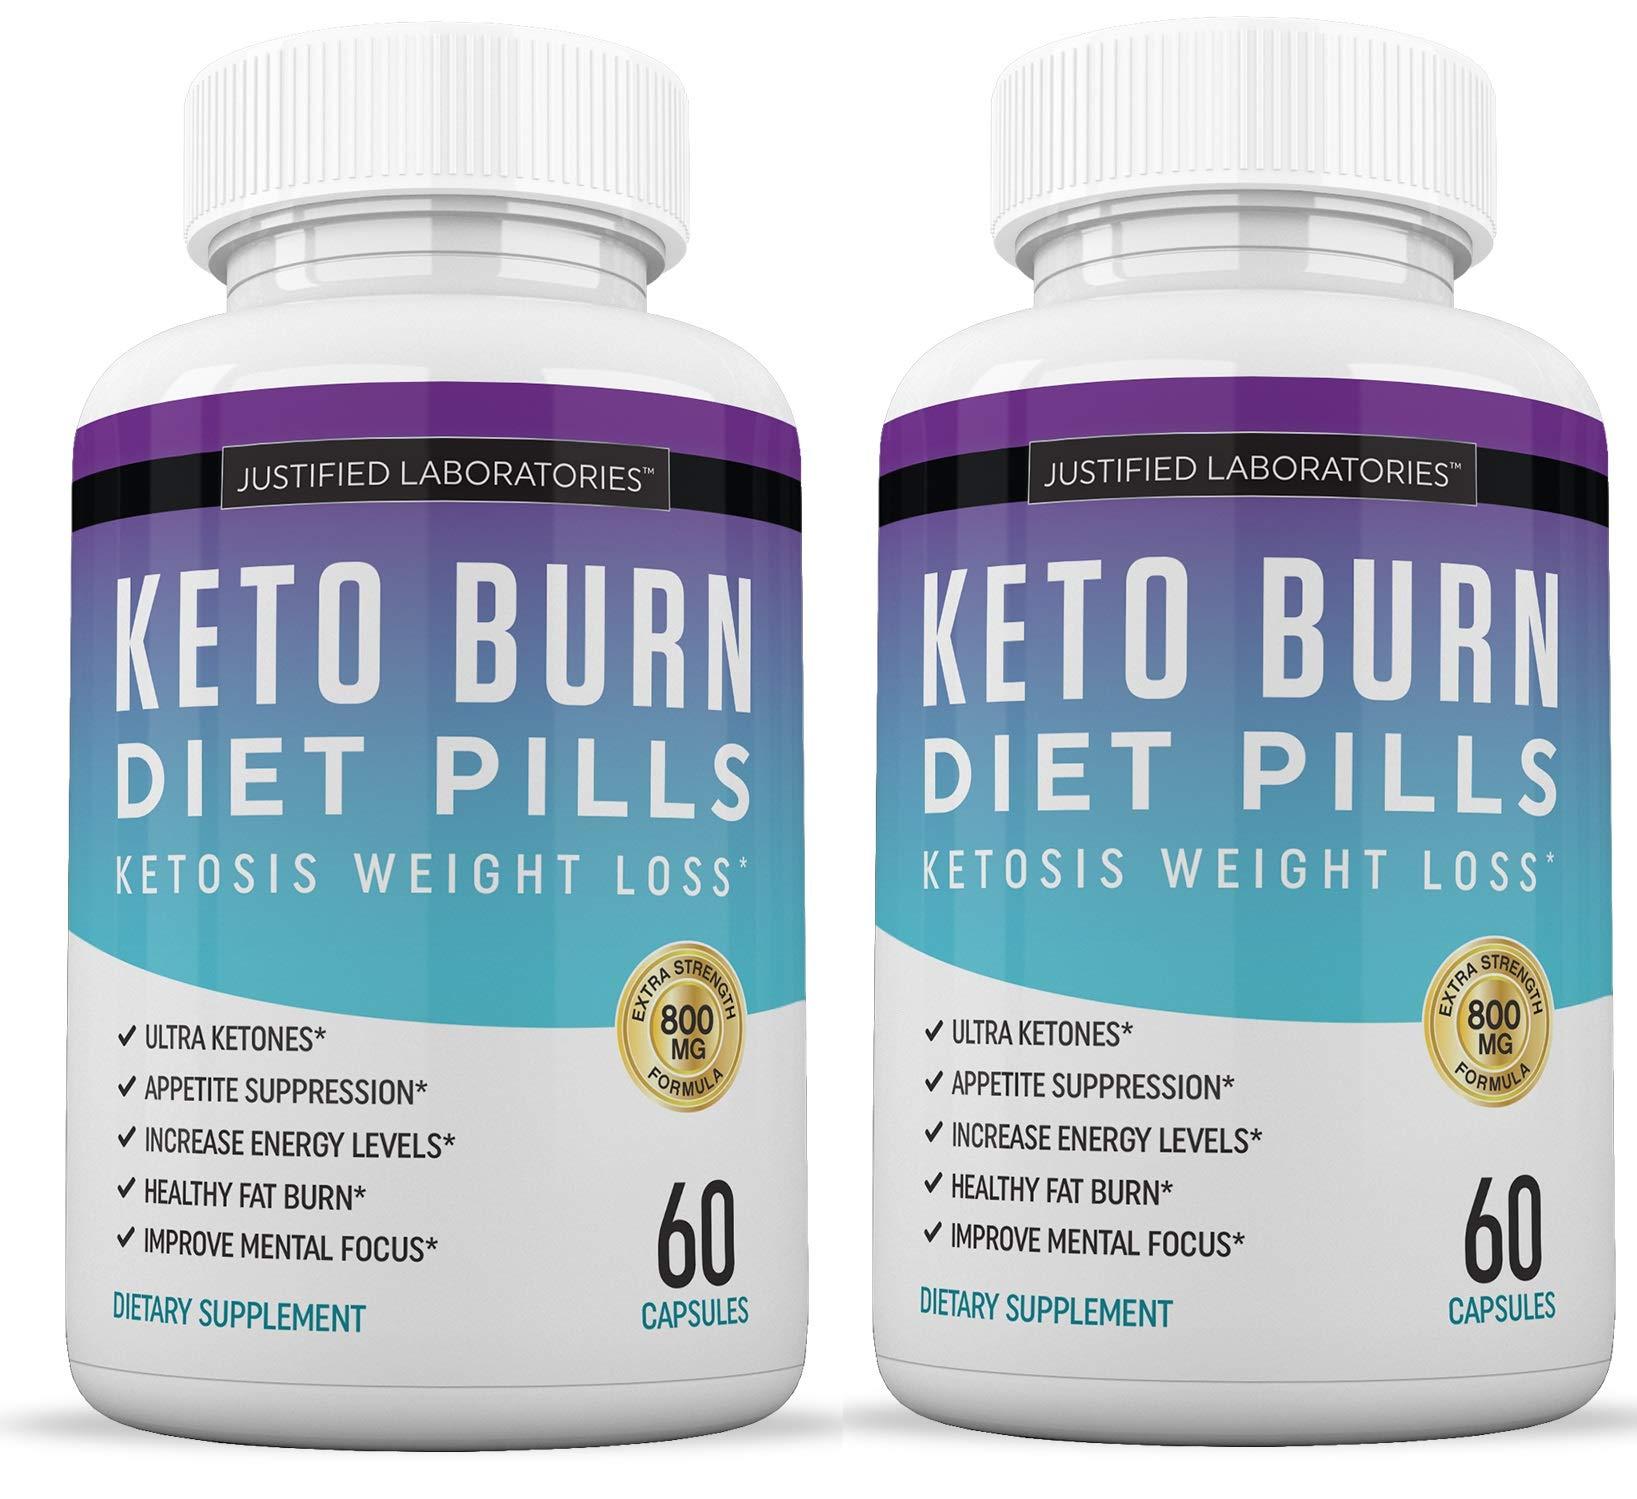 Keto Diet Pills Burn Shred BHB Salts Advanced Ketogenic Supplement Exogenous Ketones Ketosis Weight Loss Fat Burner Boost Energy Metabolism Men Women 60 Capsules 2 Bottles by Justified Laboratories